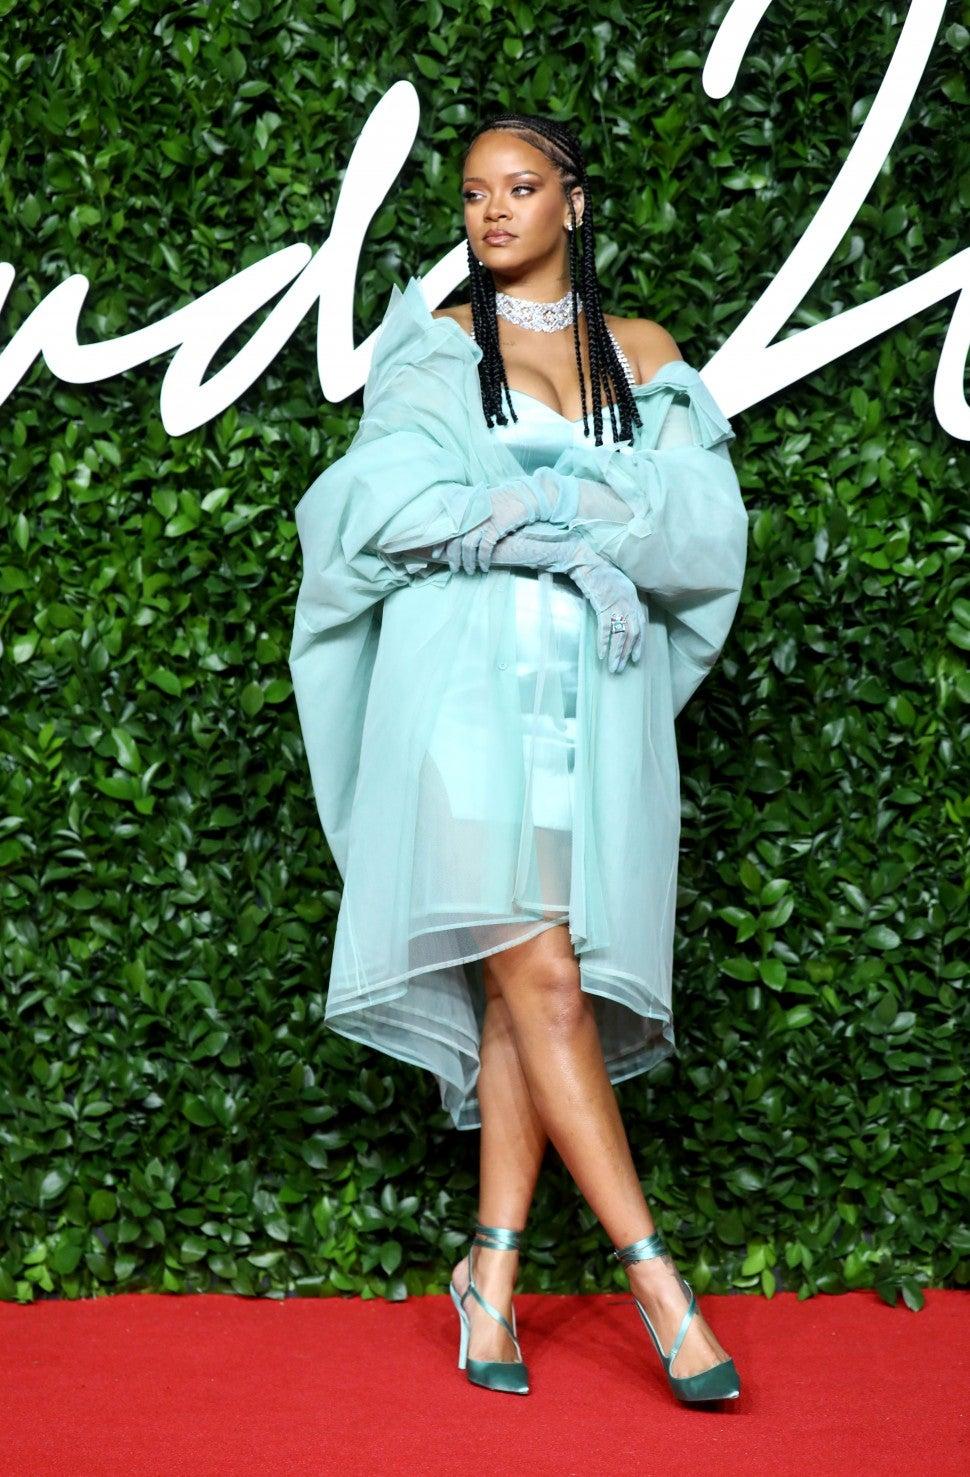 Rihanna at the 2019 British Fashion Awards